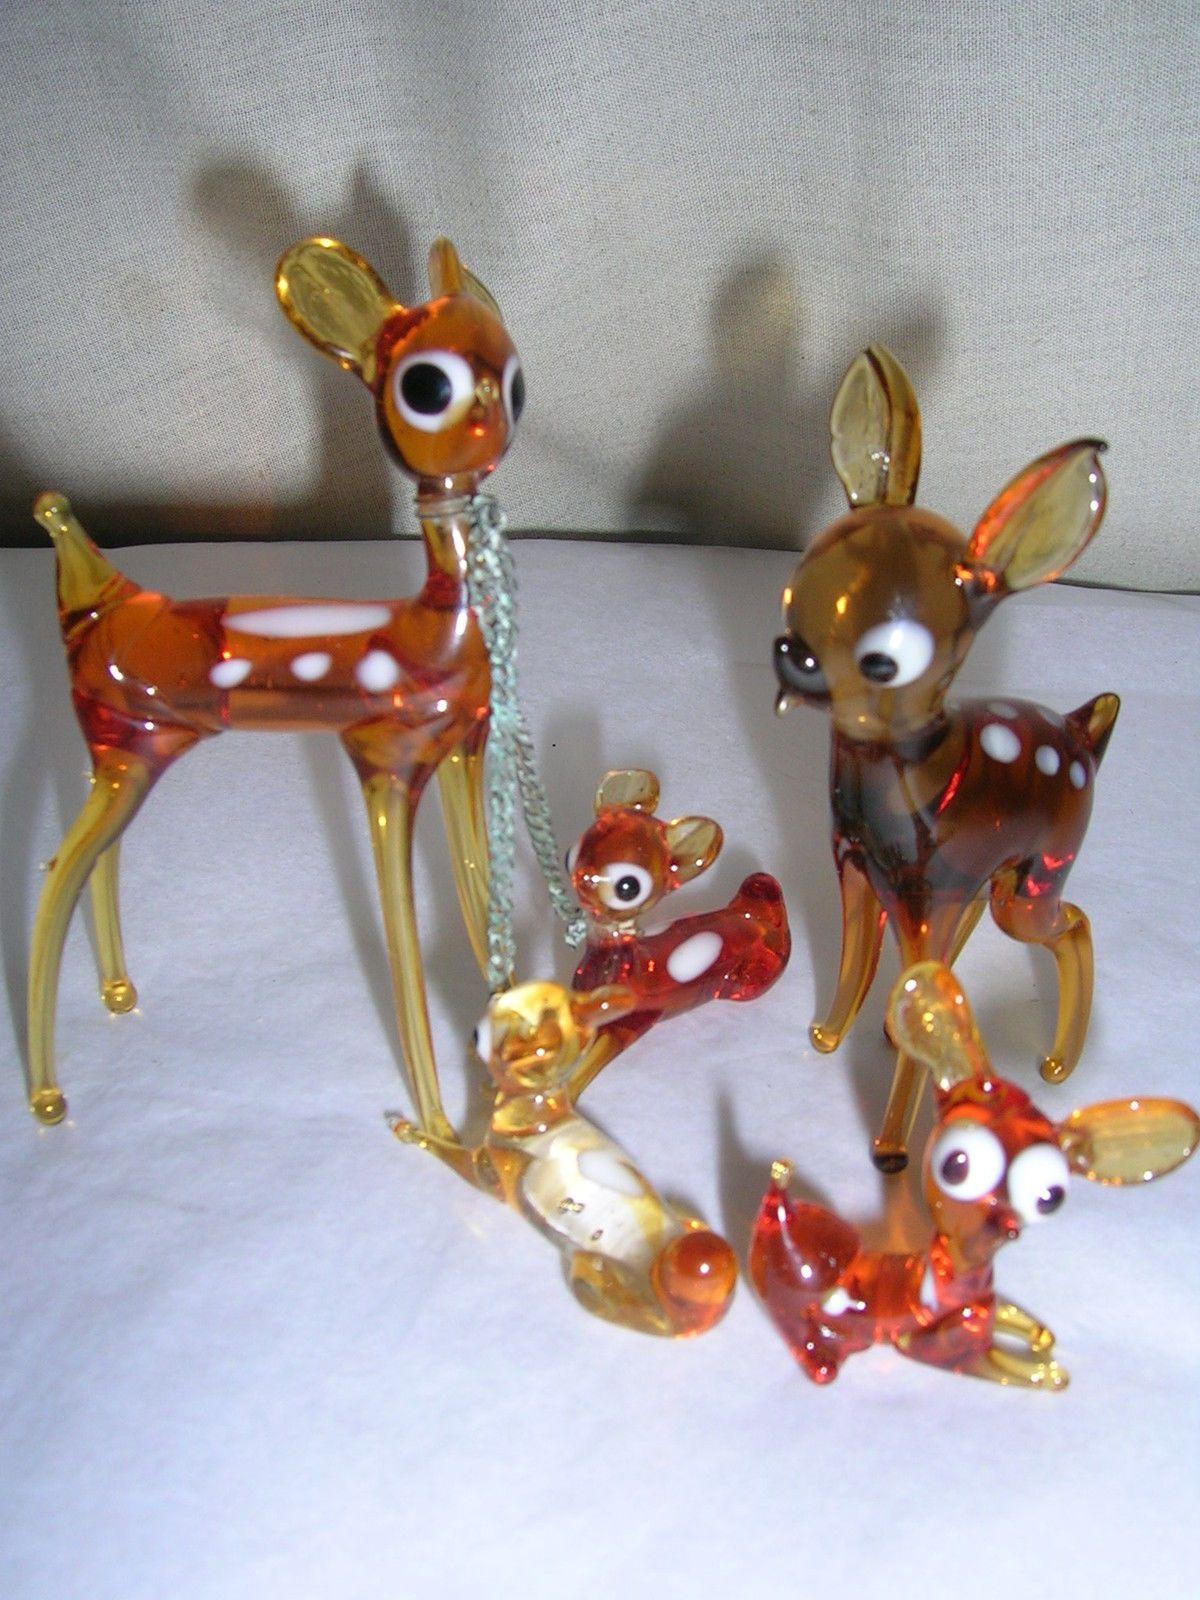 Vintage Retro Murano Five X Glass Bambi Deer Figurines Ornaments Ebay Vintage Kitsch Retro Vintage Retro